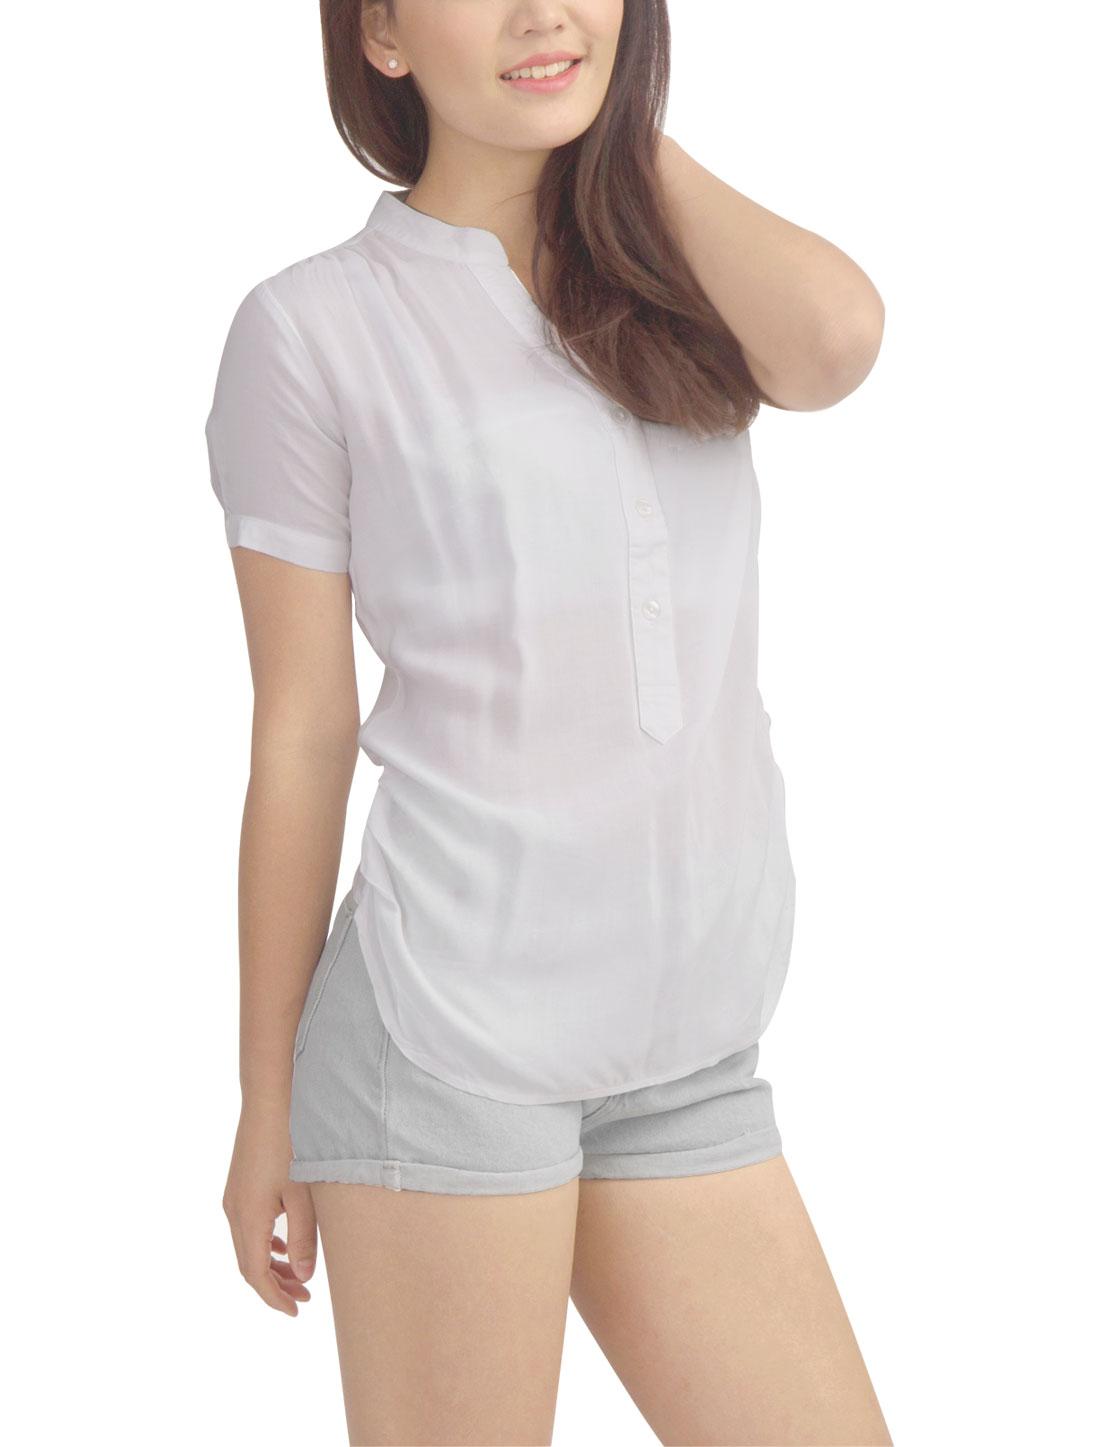 Ladies Casual Short Sleeve Three Button Closure Soft Top Shirt White XL